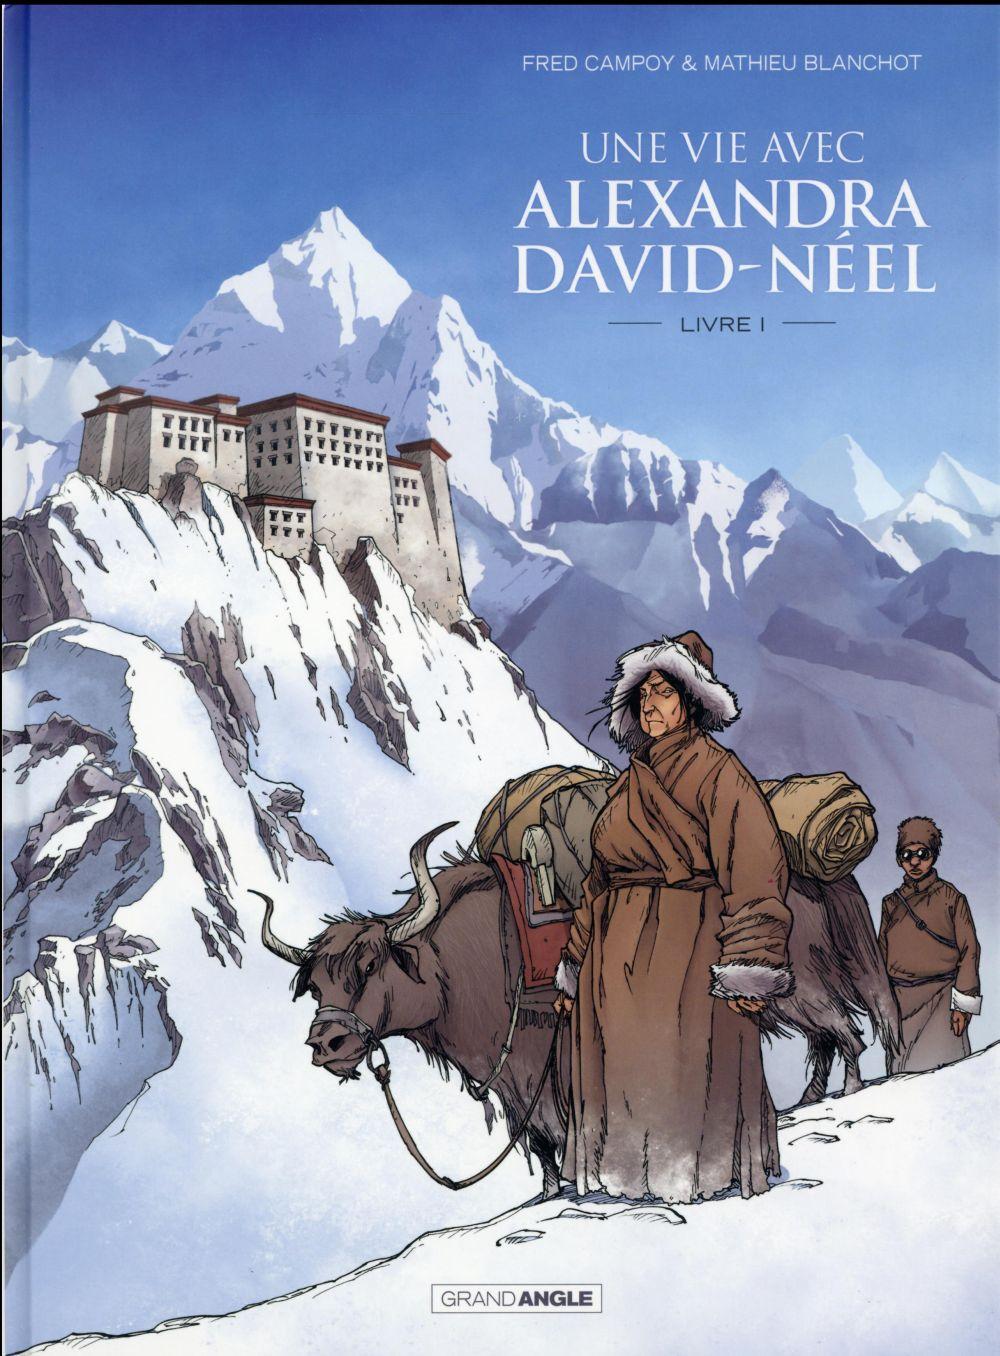 Blanchot Mathieu - UNE VIE AVEC ALEXANDRA DAVID-NEEL - VOLUME 1